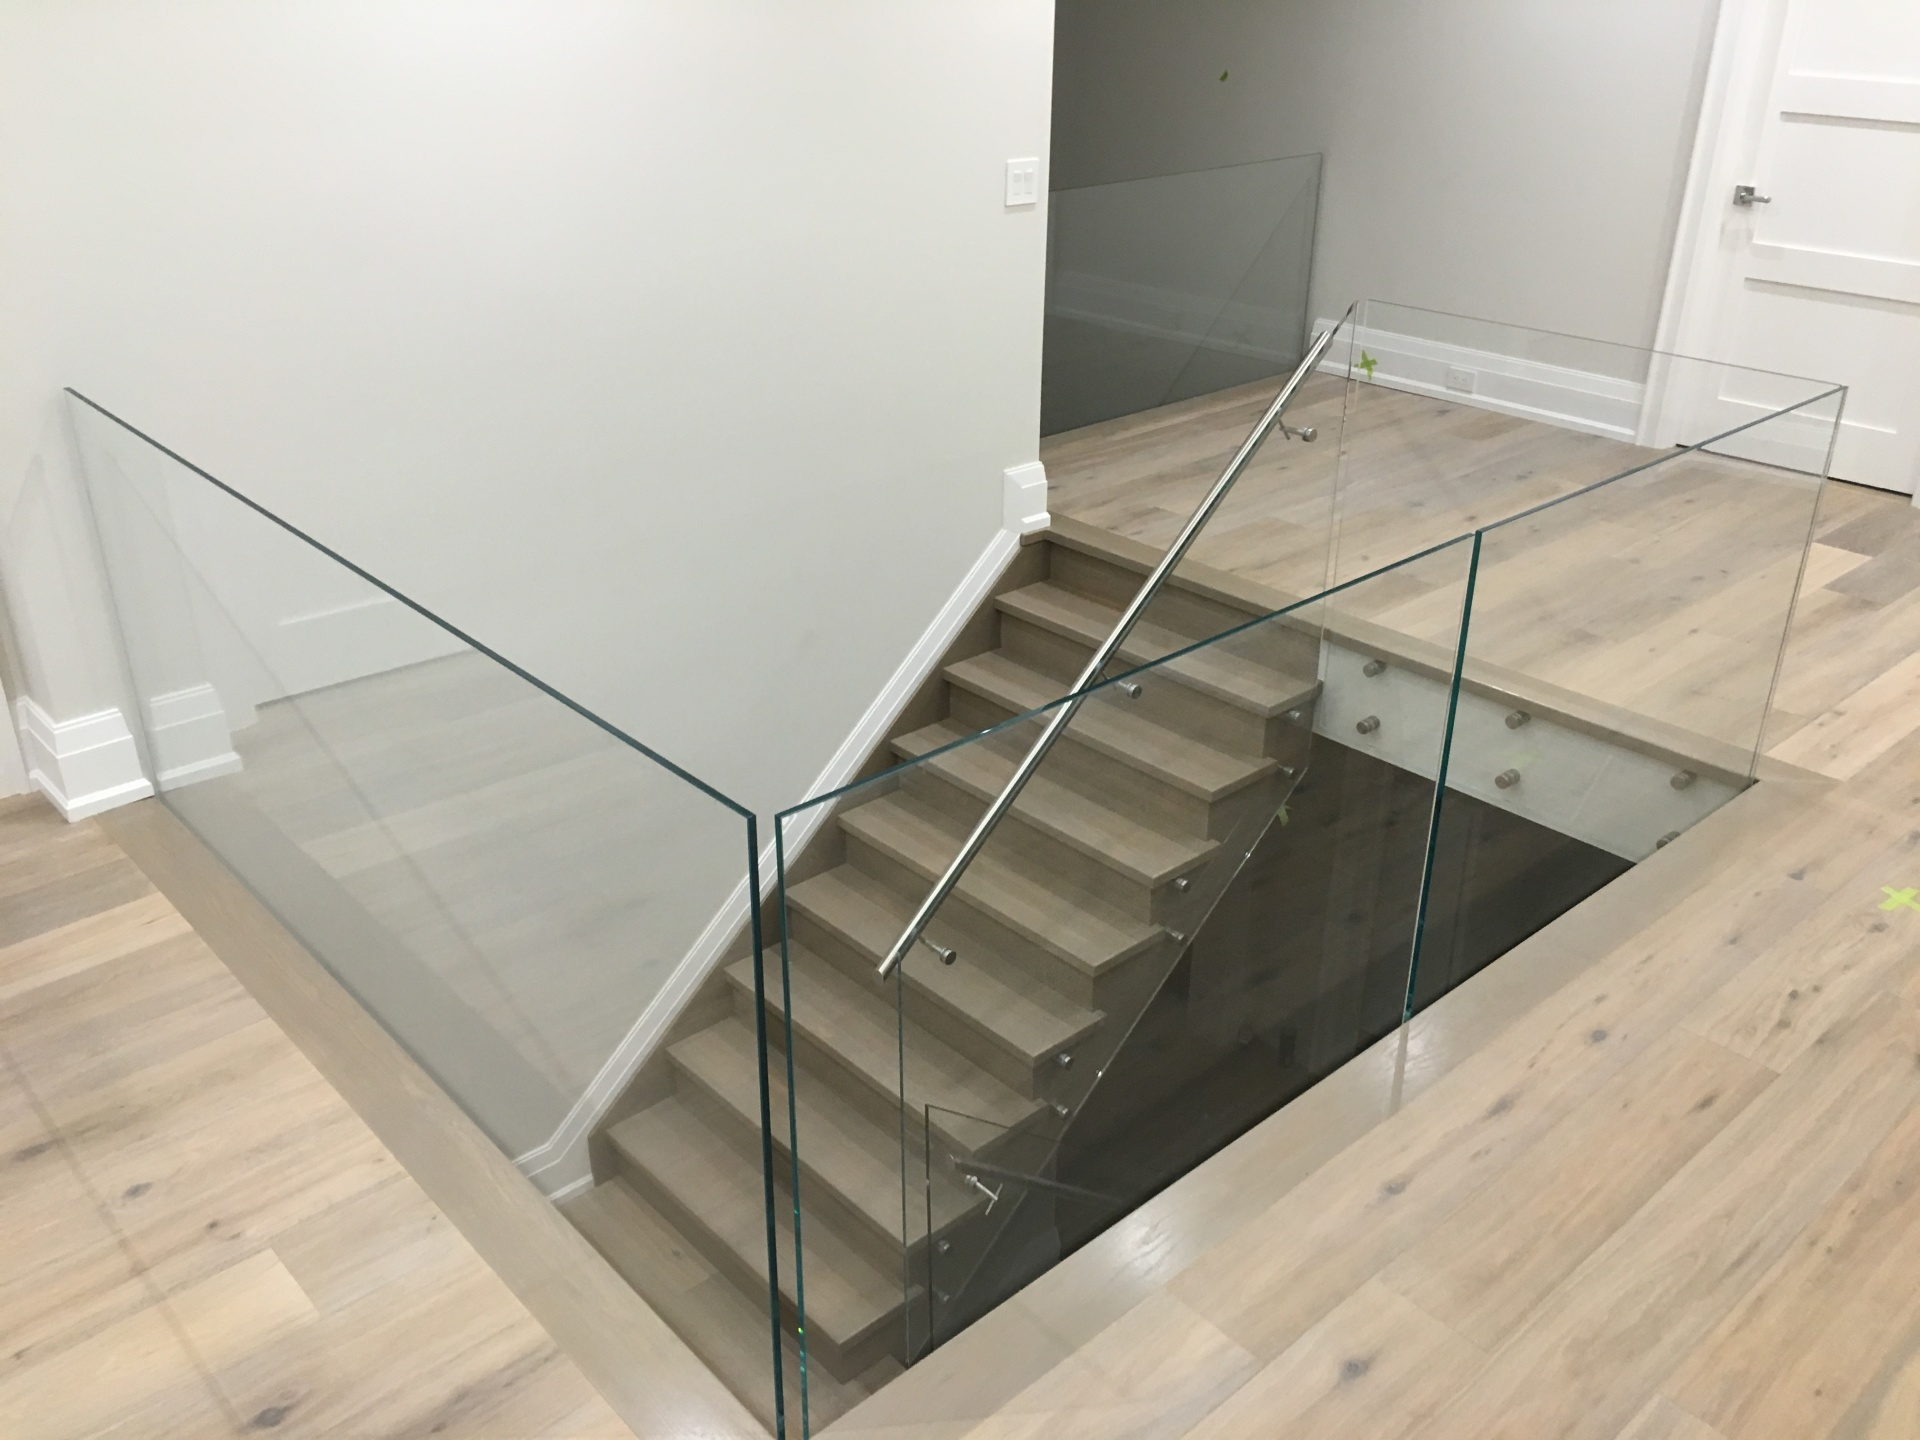 Low iron glass railing